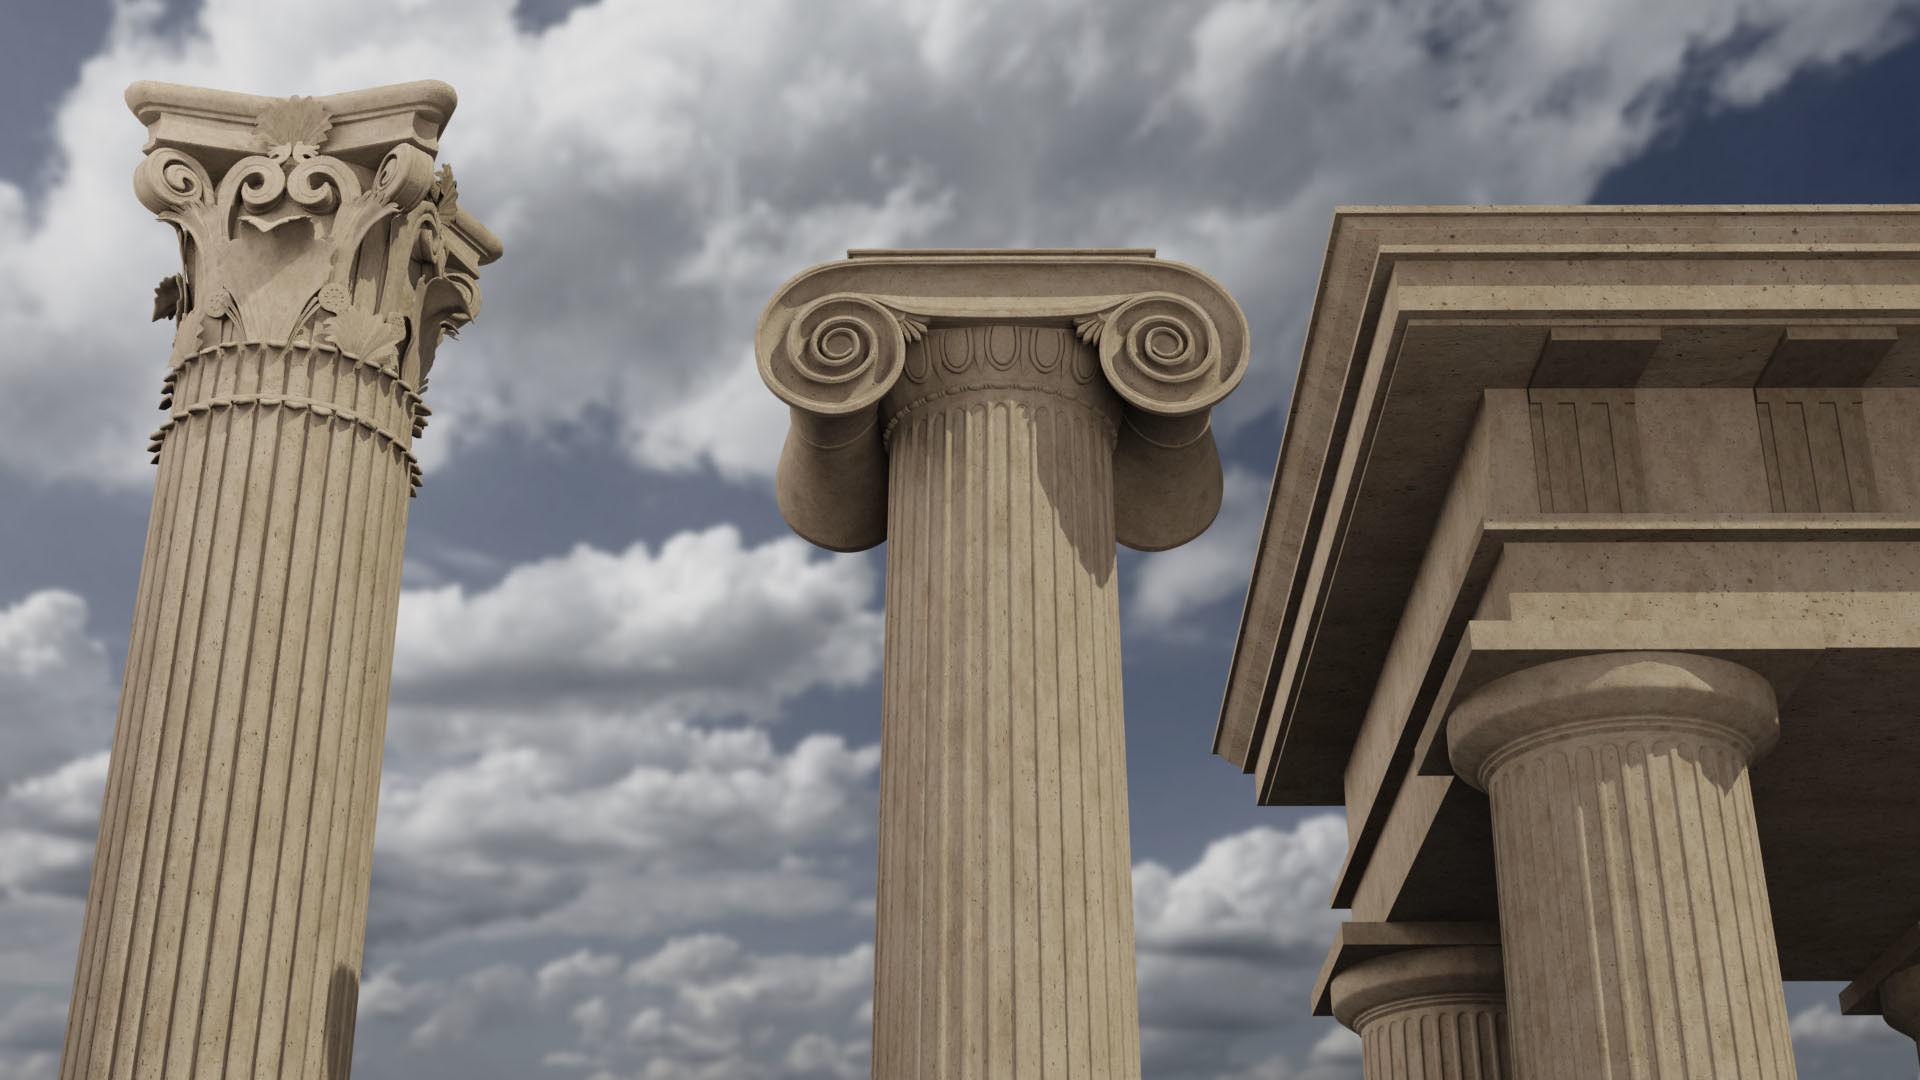 Classical column collection - Doric ionic corinthian